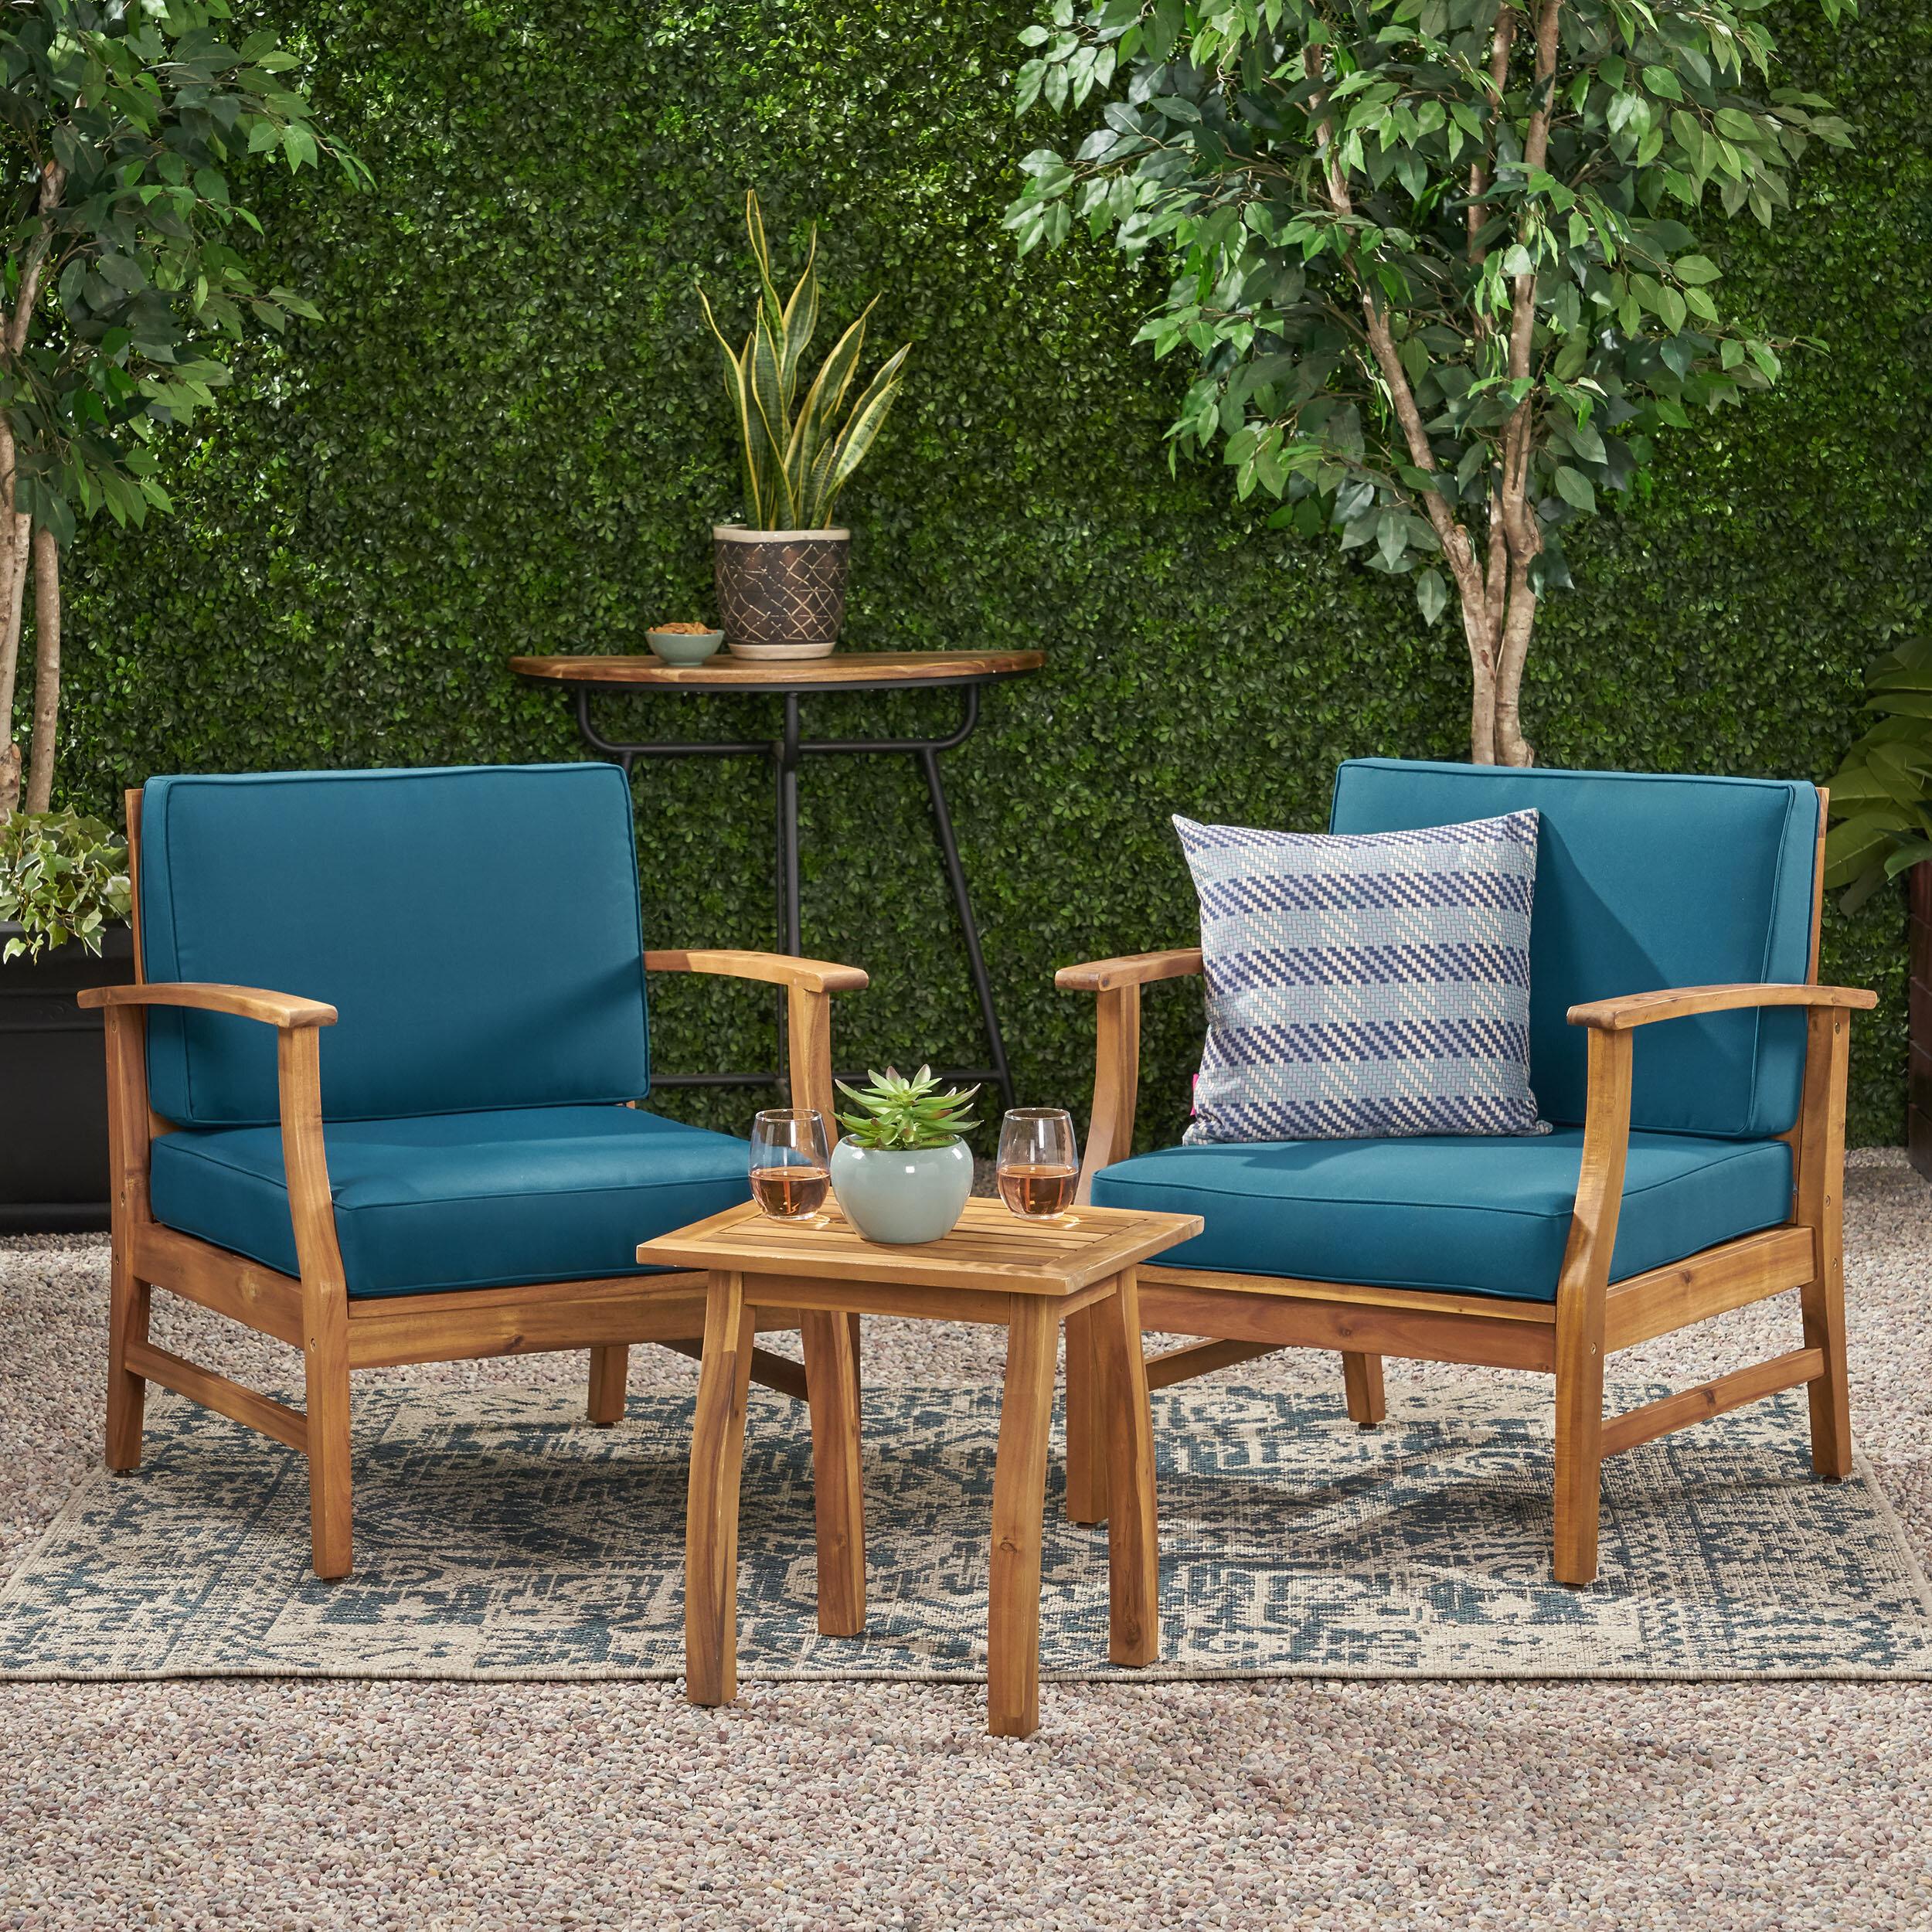 Acacia Blue Wood Patio Conversation Sets You Ll Love In 2021 Wayfair